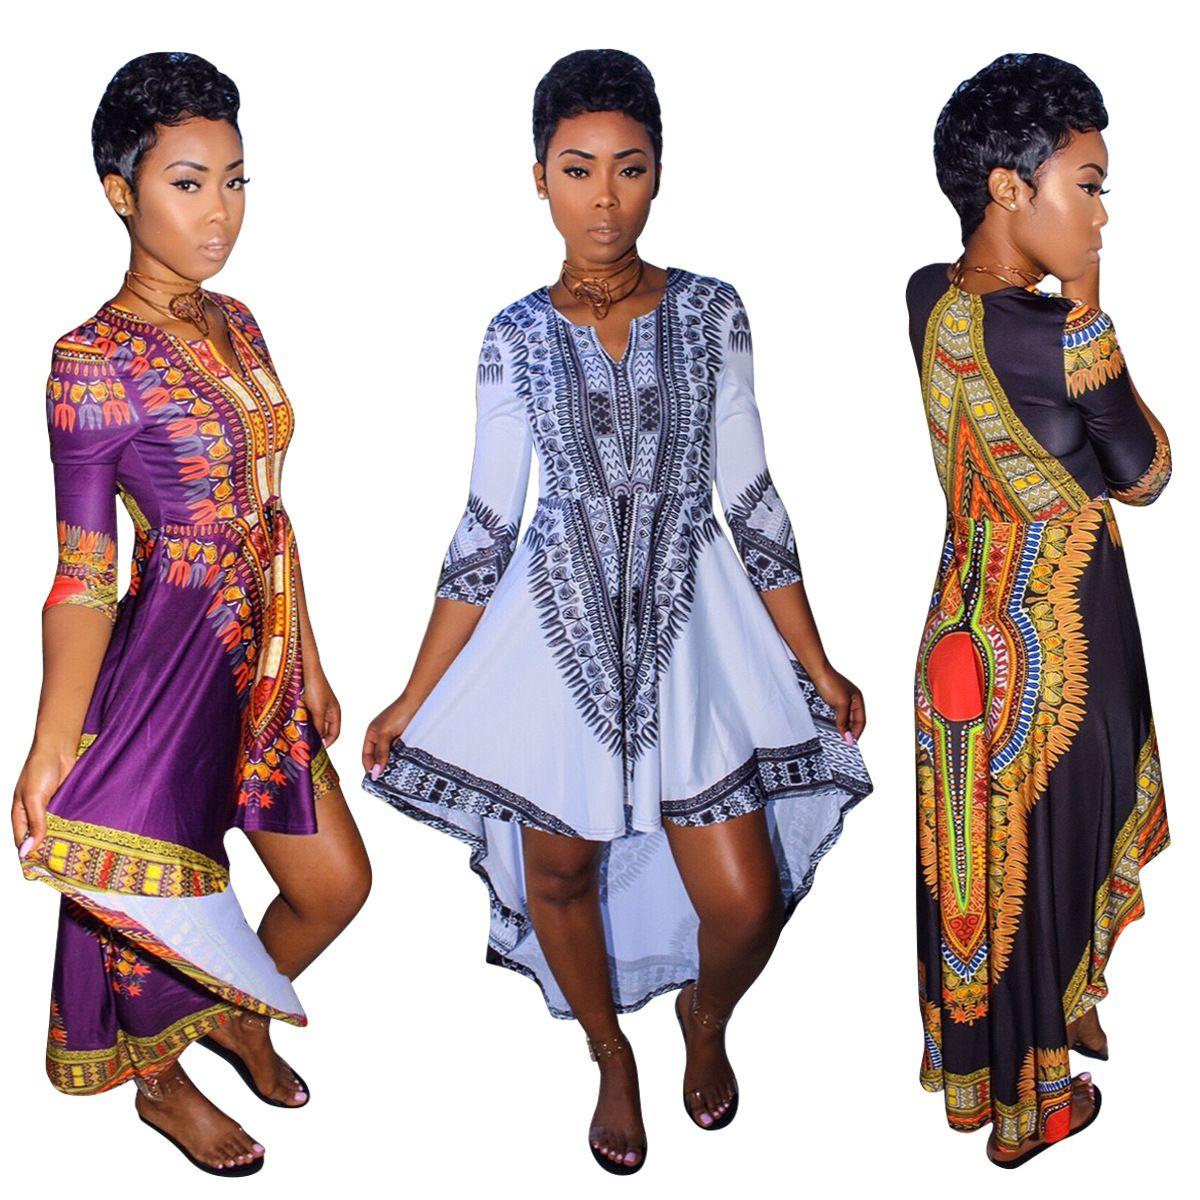 b9763dc4705 African Clothes For Women O Neck Africa Bazin Dress Dashiki Women Dress  2017 African Print Outwear Office Bazin Riche Party Dress Big Size Floral  Dress ...